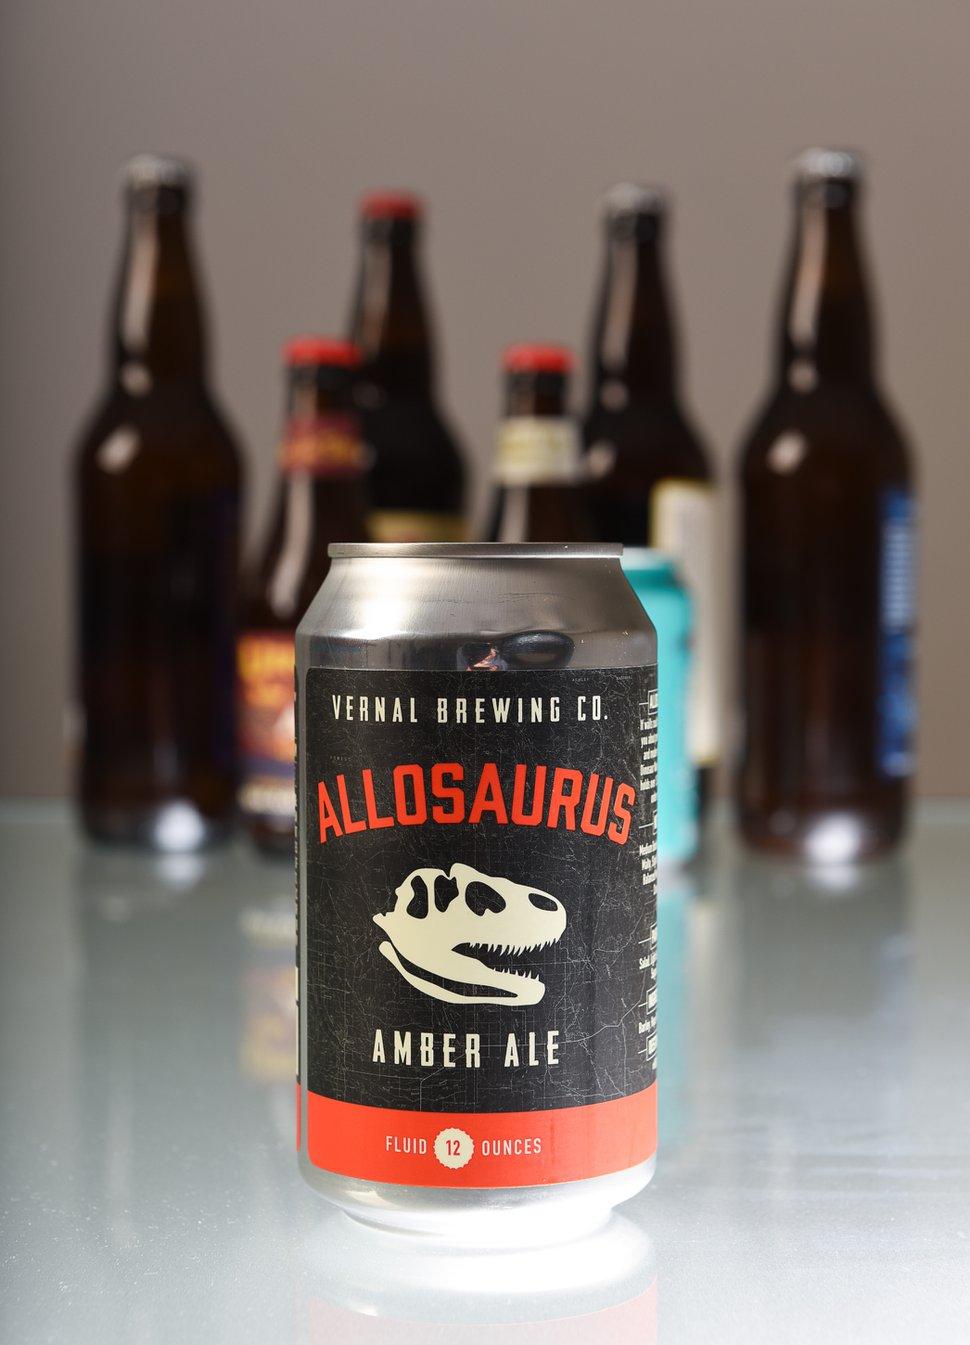 (Francisco Kjolseth | The Salt Lake Tribune) Utah's best beer names. Allosaurus amber ale by Vernal Brewing Co.